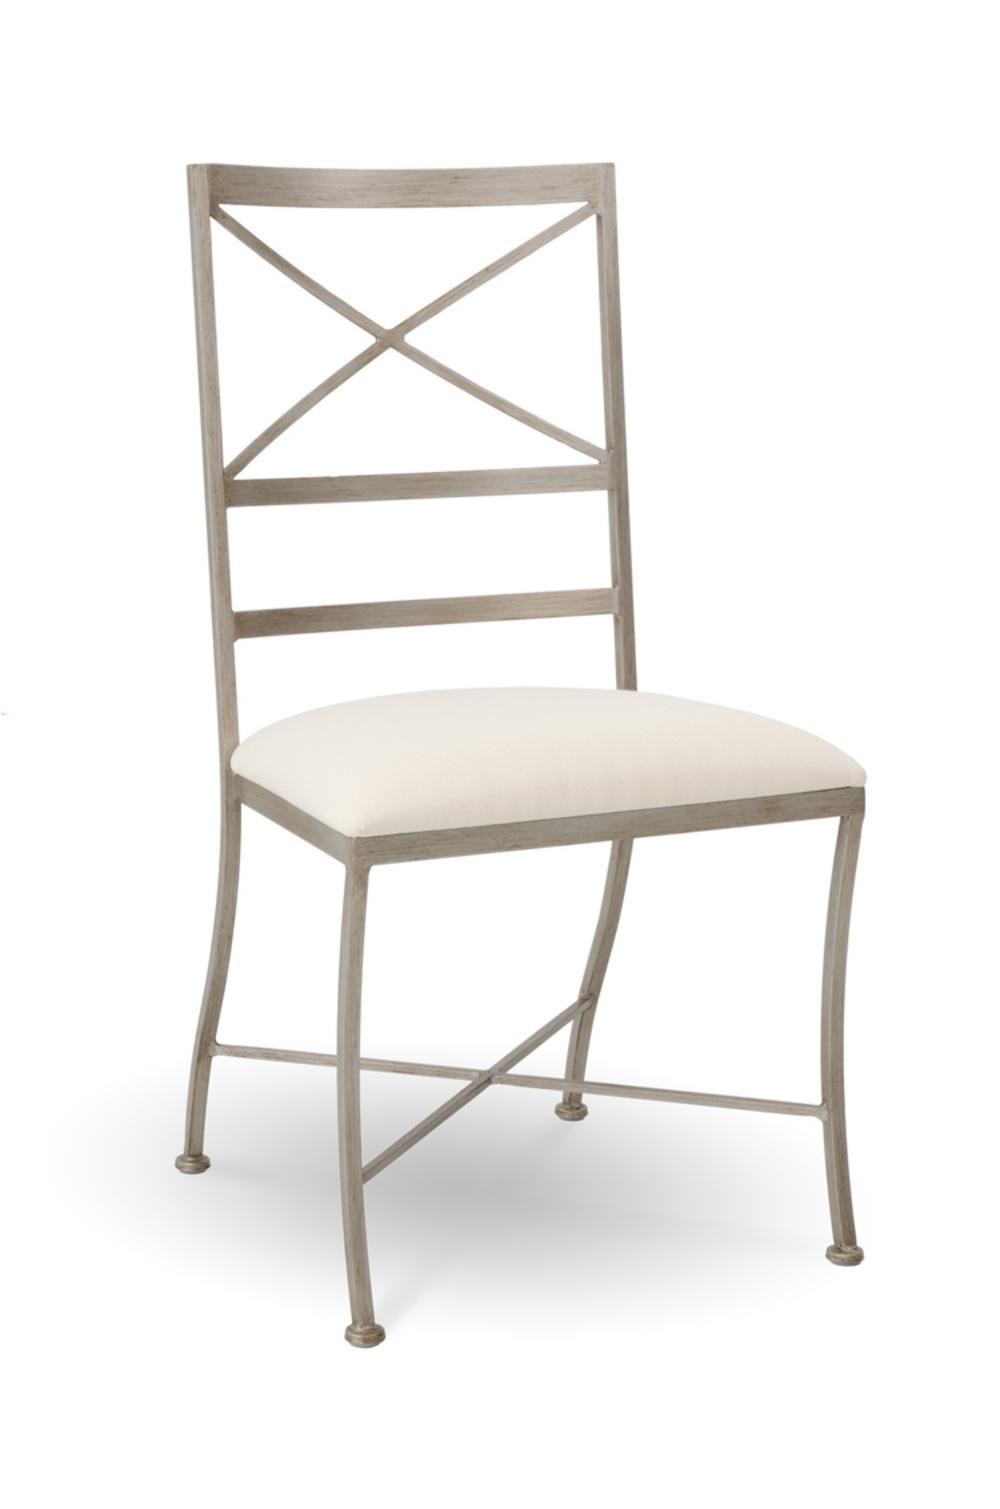 Charleston Forge - Barkley Chair